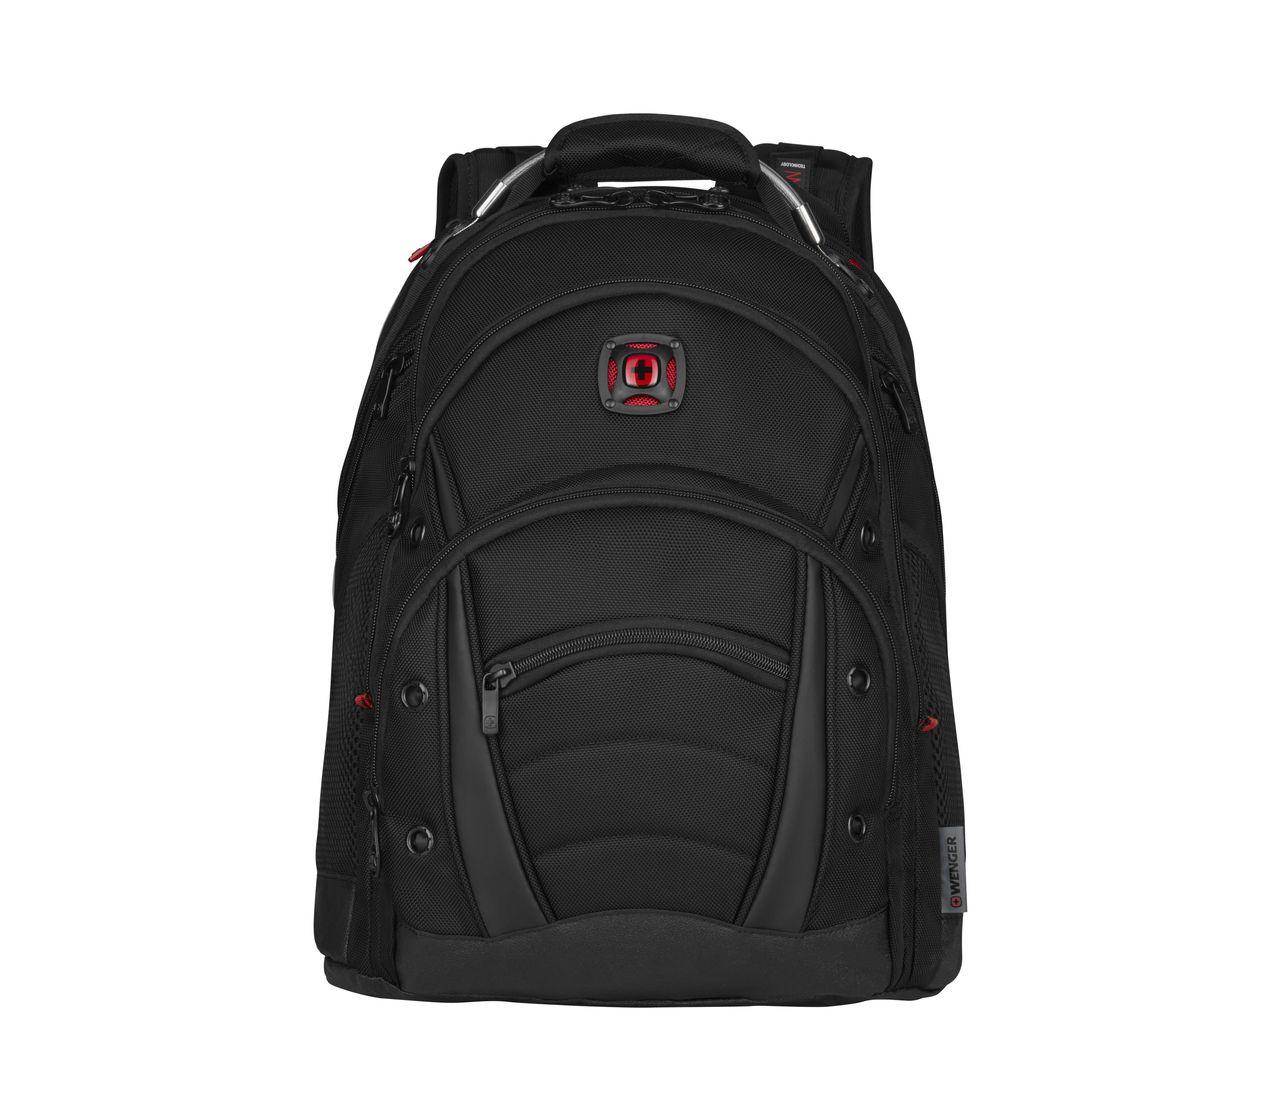 Wenger Synergy 16 Laptop Backpack In Black 605074